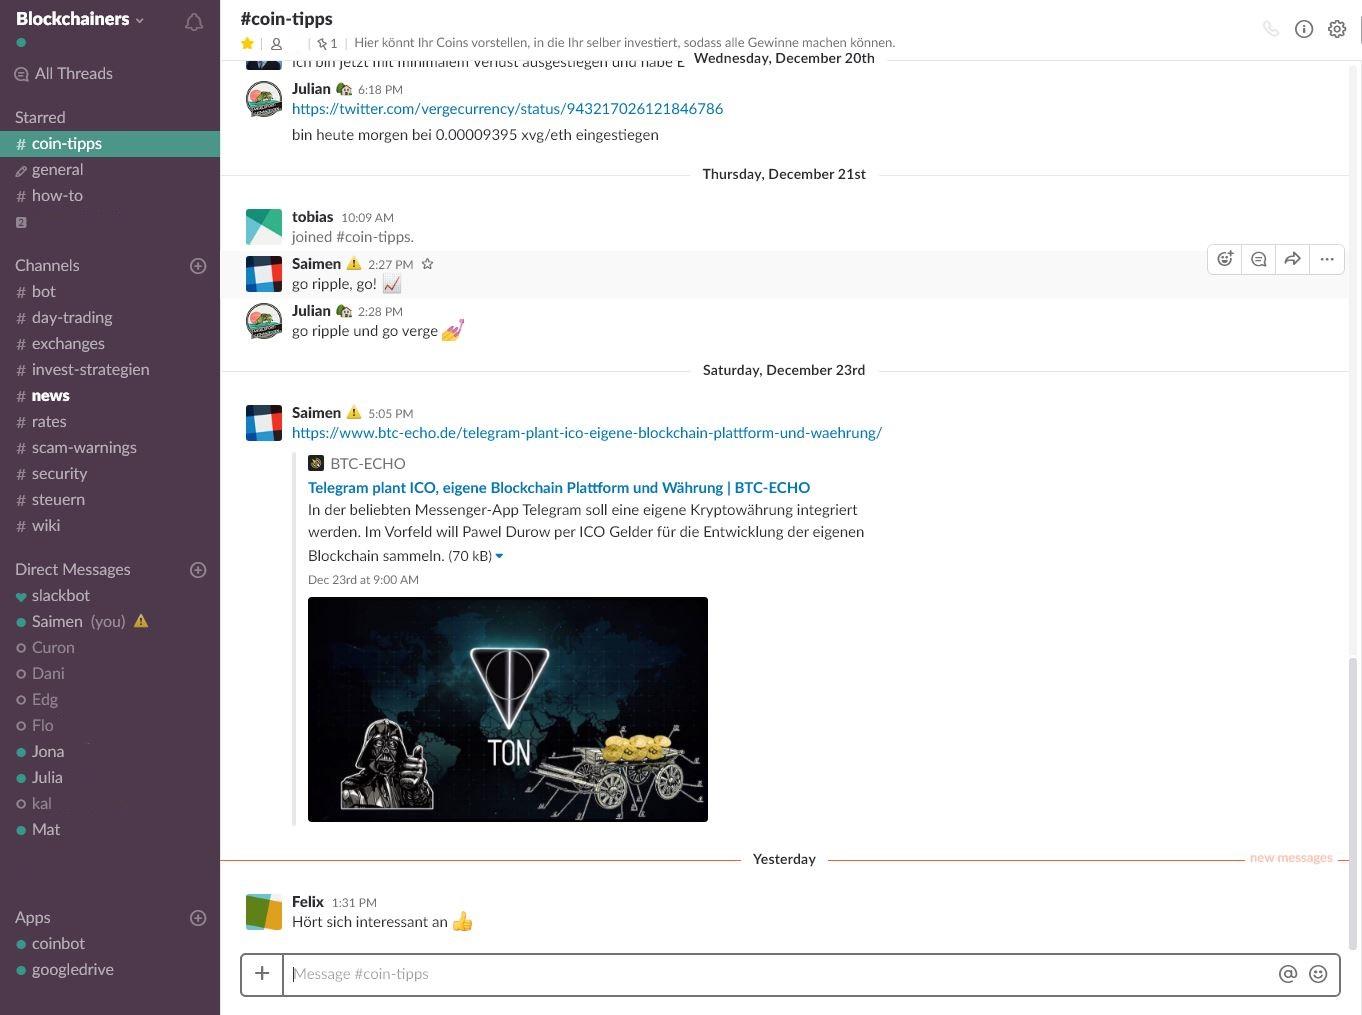 Blockchainers Community